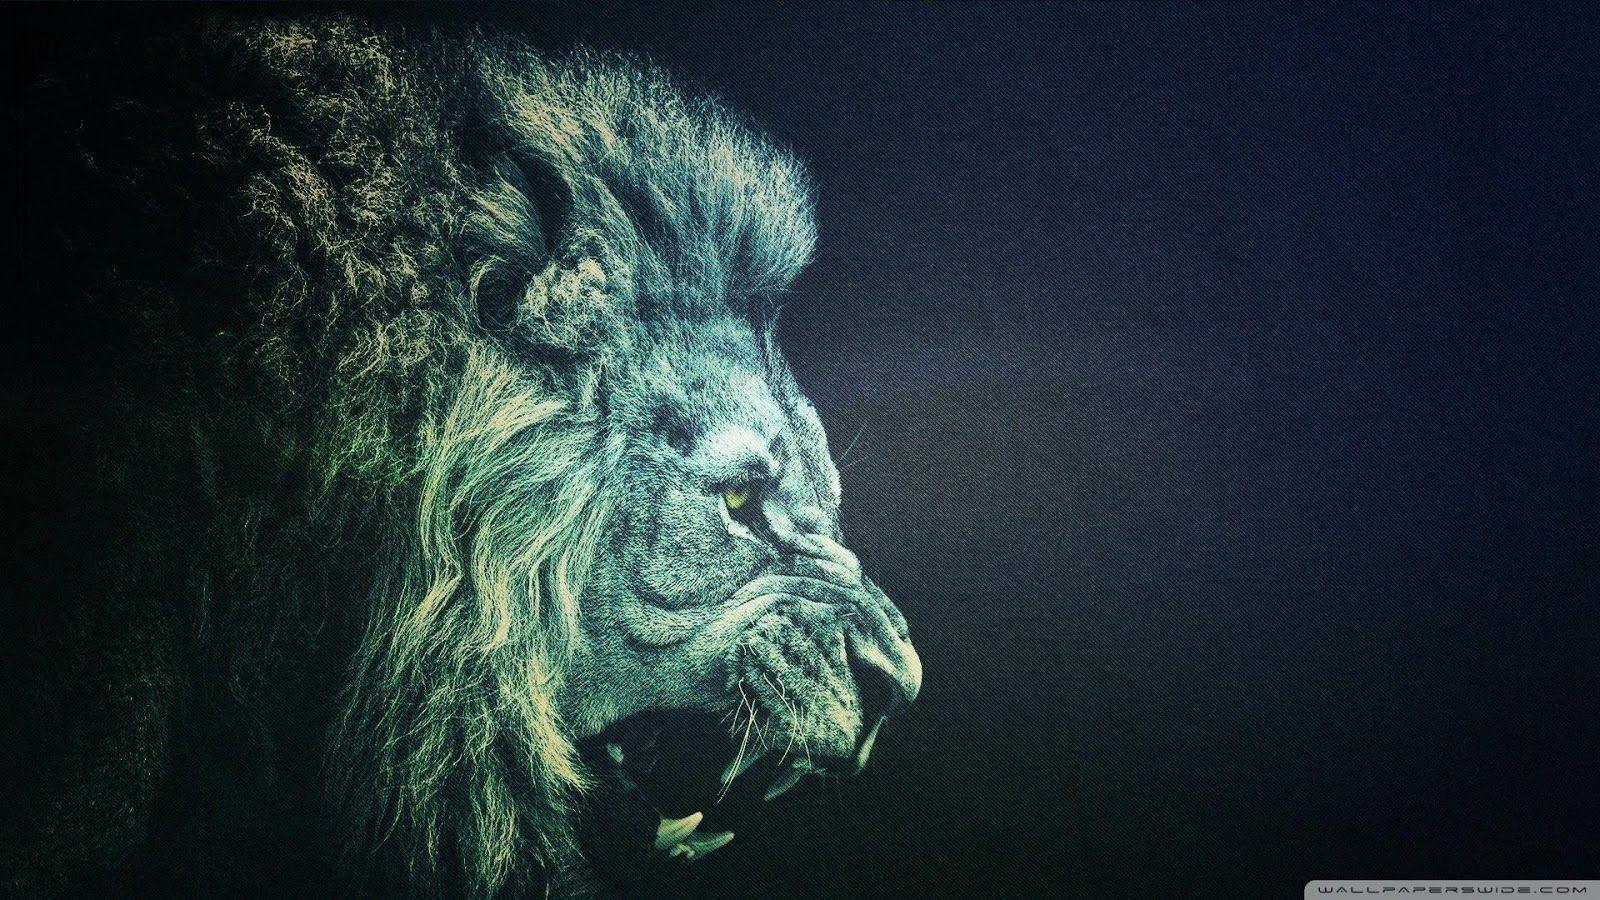 1080p Hd Lion Full Hd Wallpaper High Quality Desktop Iphone